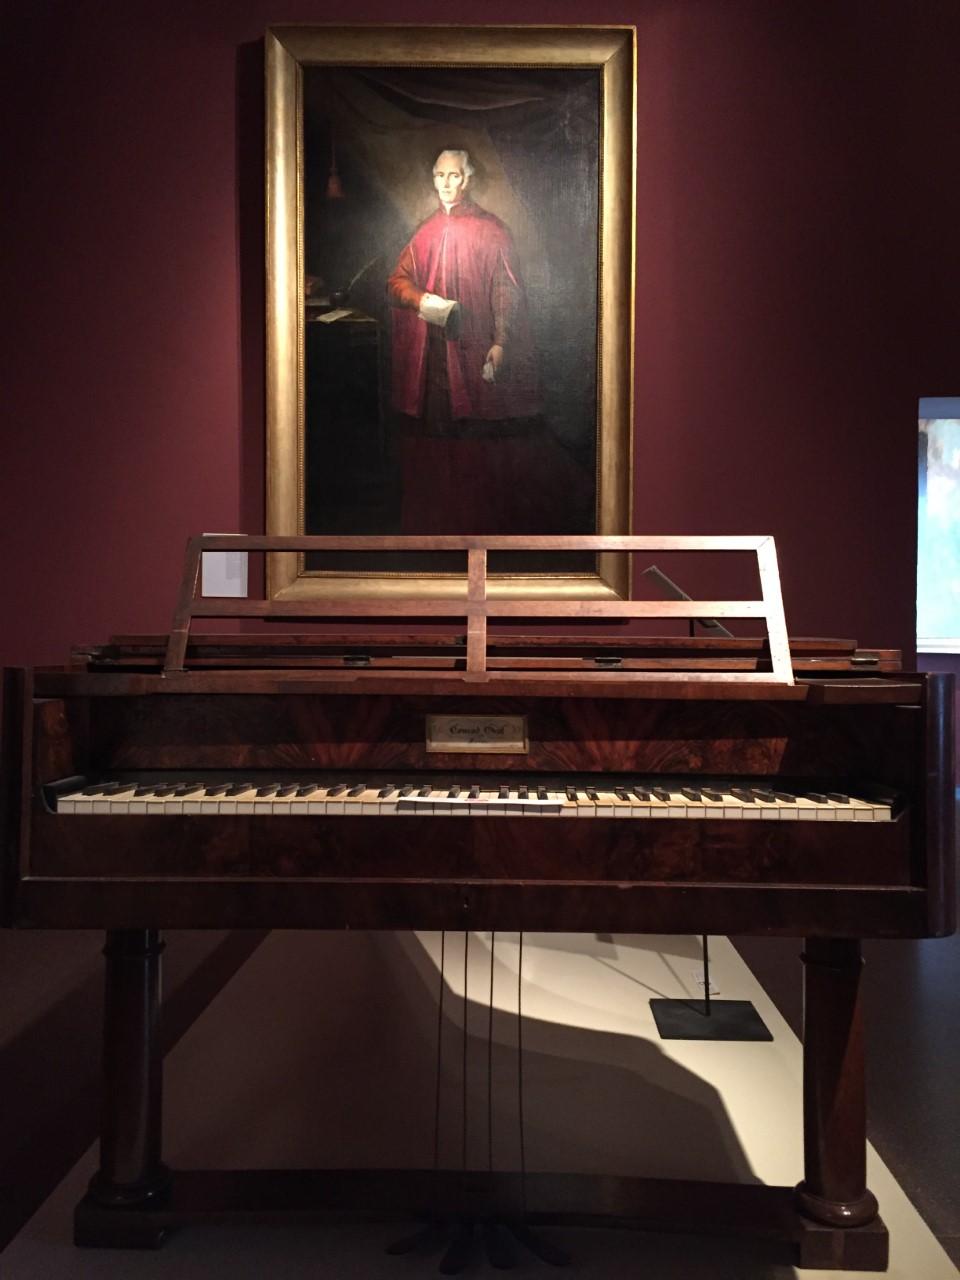 PIANO FORTE - CONRAD GRAF - OPUS 825